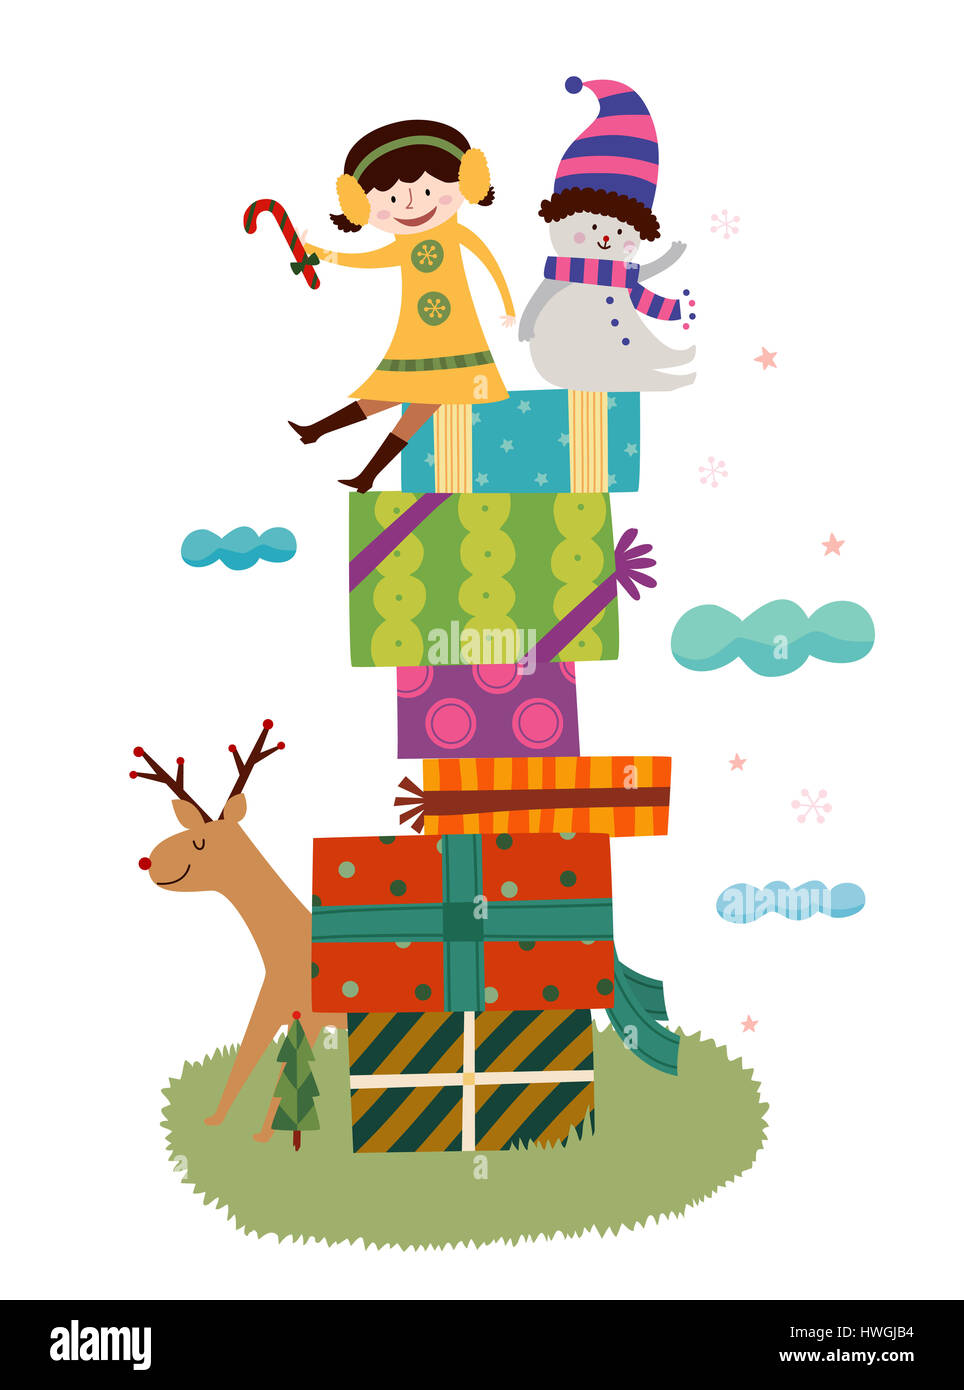 Merry Christmas (MerryChristmas) - Stock Image